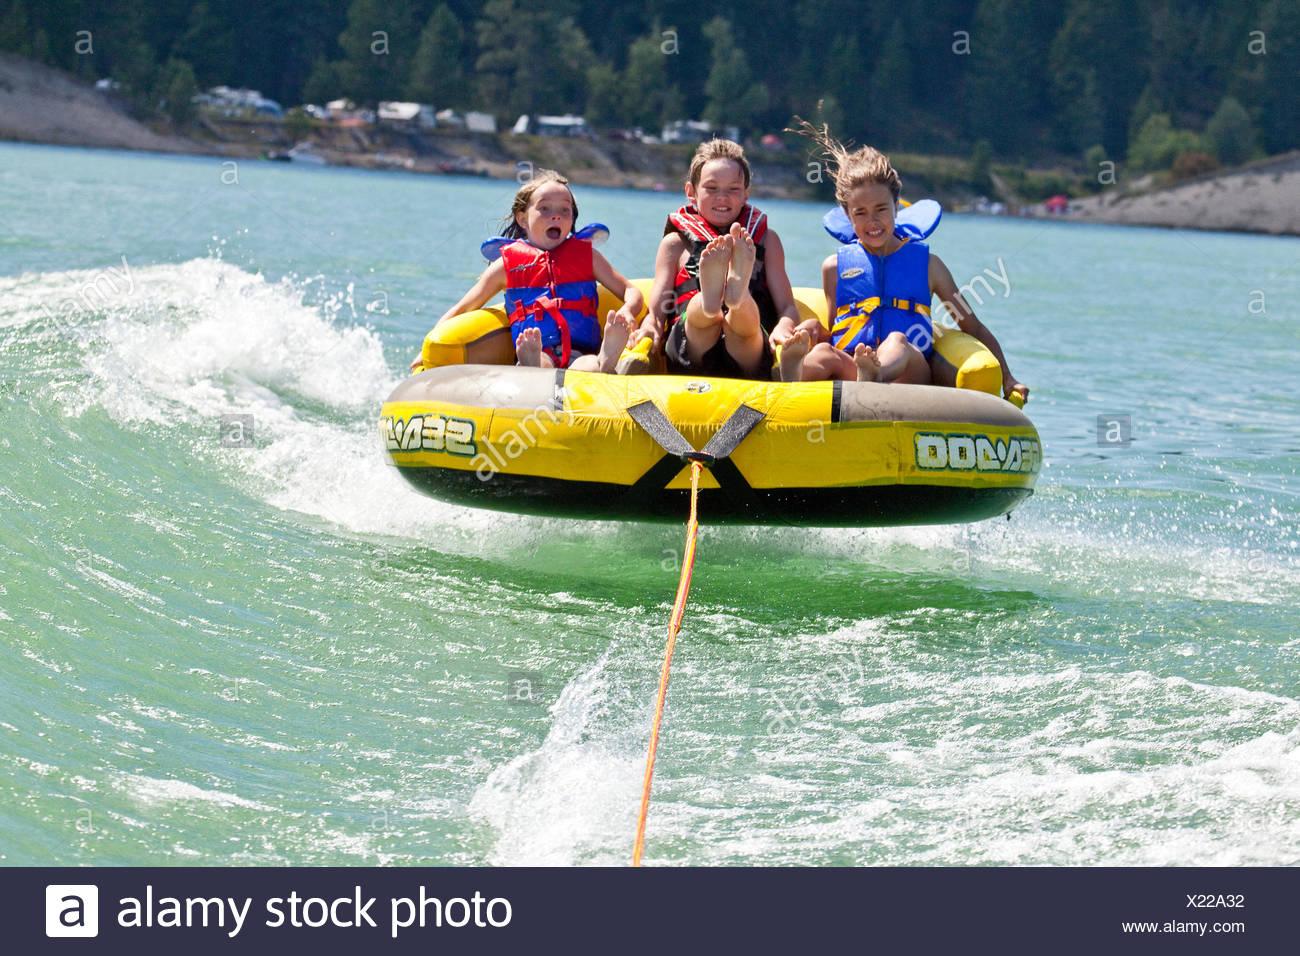 Three children enjoy tubing on Lake Koocanusa, East Kootenays, BC, Canada. - Stock Image